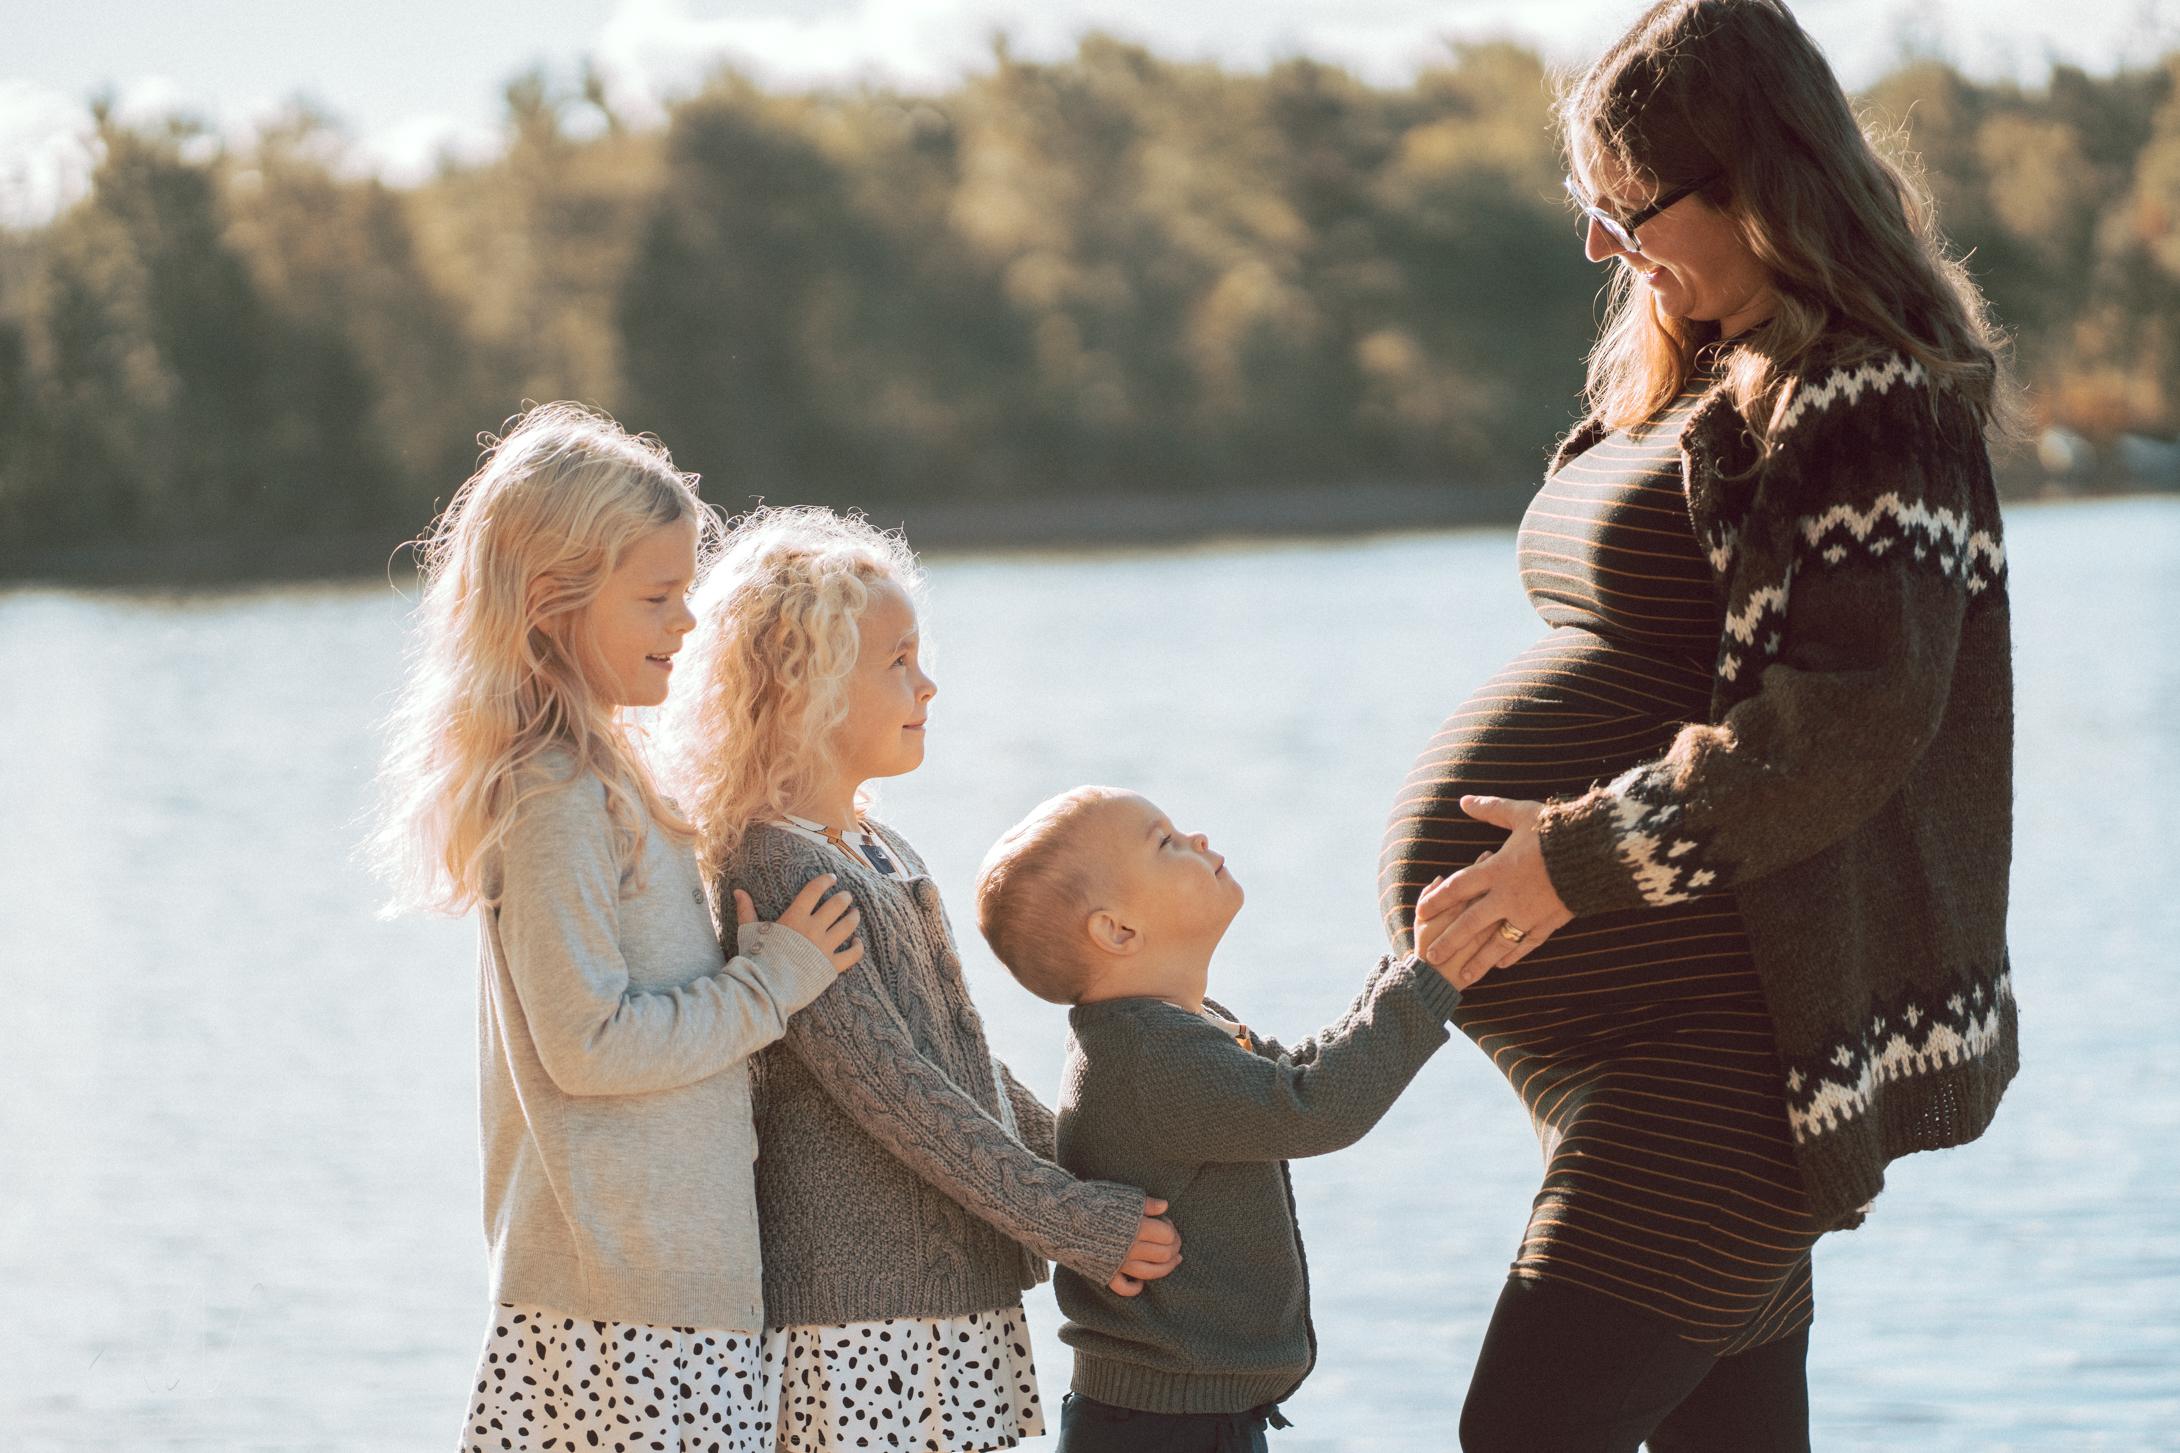 gravidfoto-familjefoto-fotograf-max-norin-4.jpg